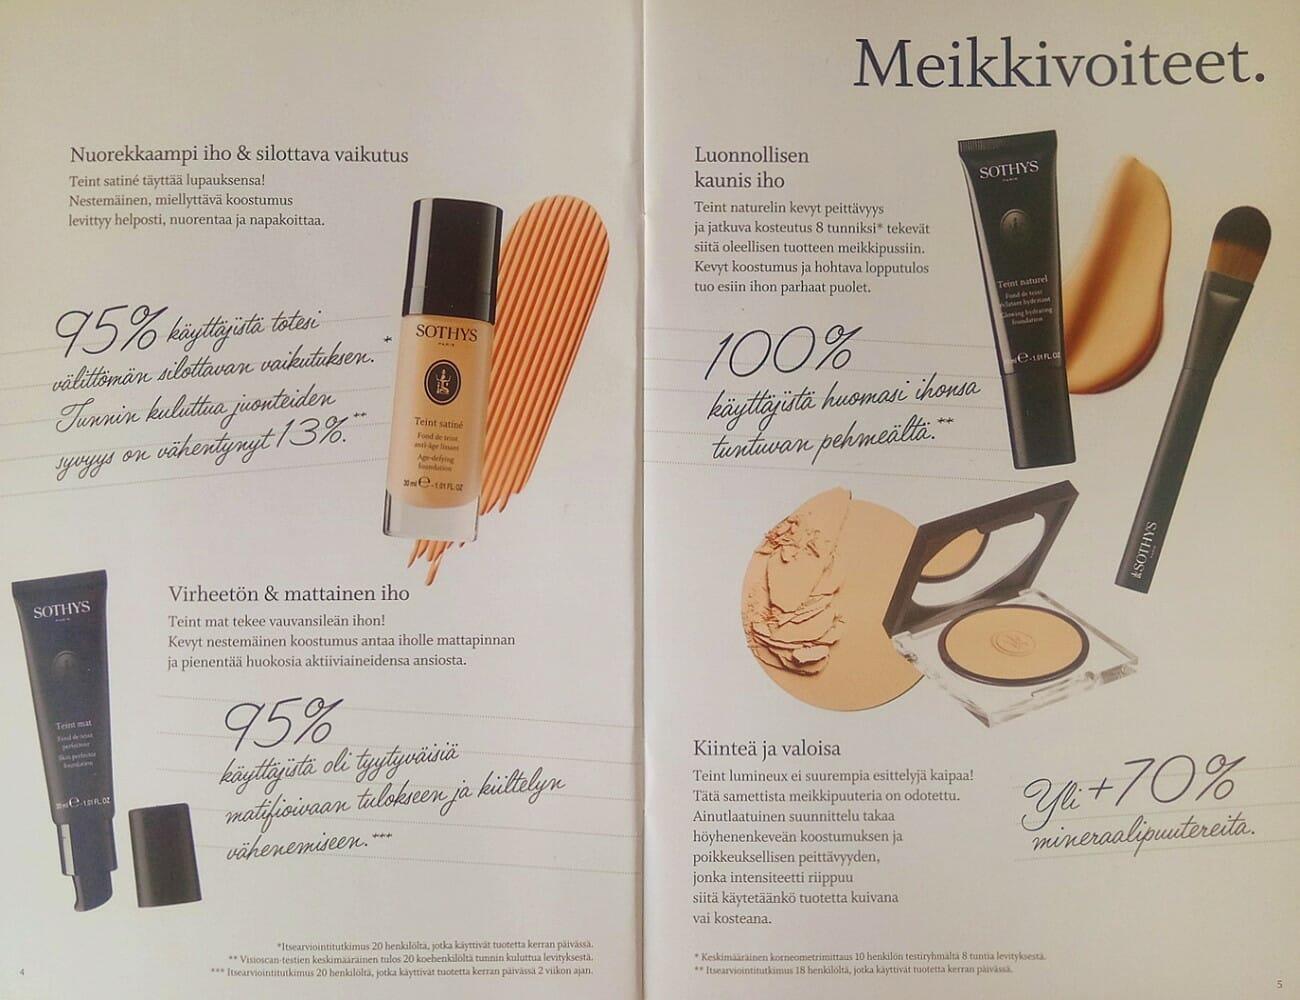 Sothys MakeUp Esite 2018 sivu 03 Kauneushoitola BellaHelena Oulu Helena & Paris Oy Helena ja Markku Tauriainen Suomi 100 Finland